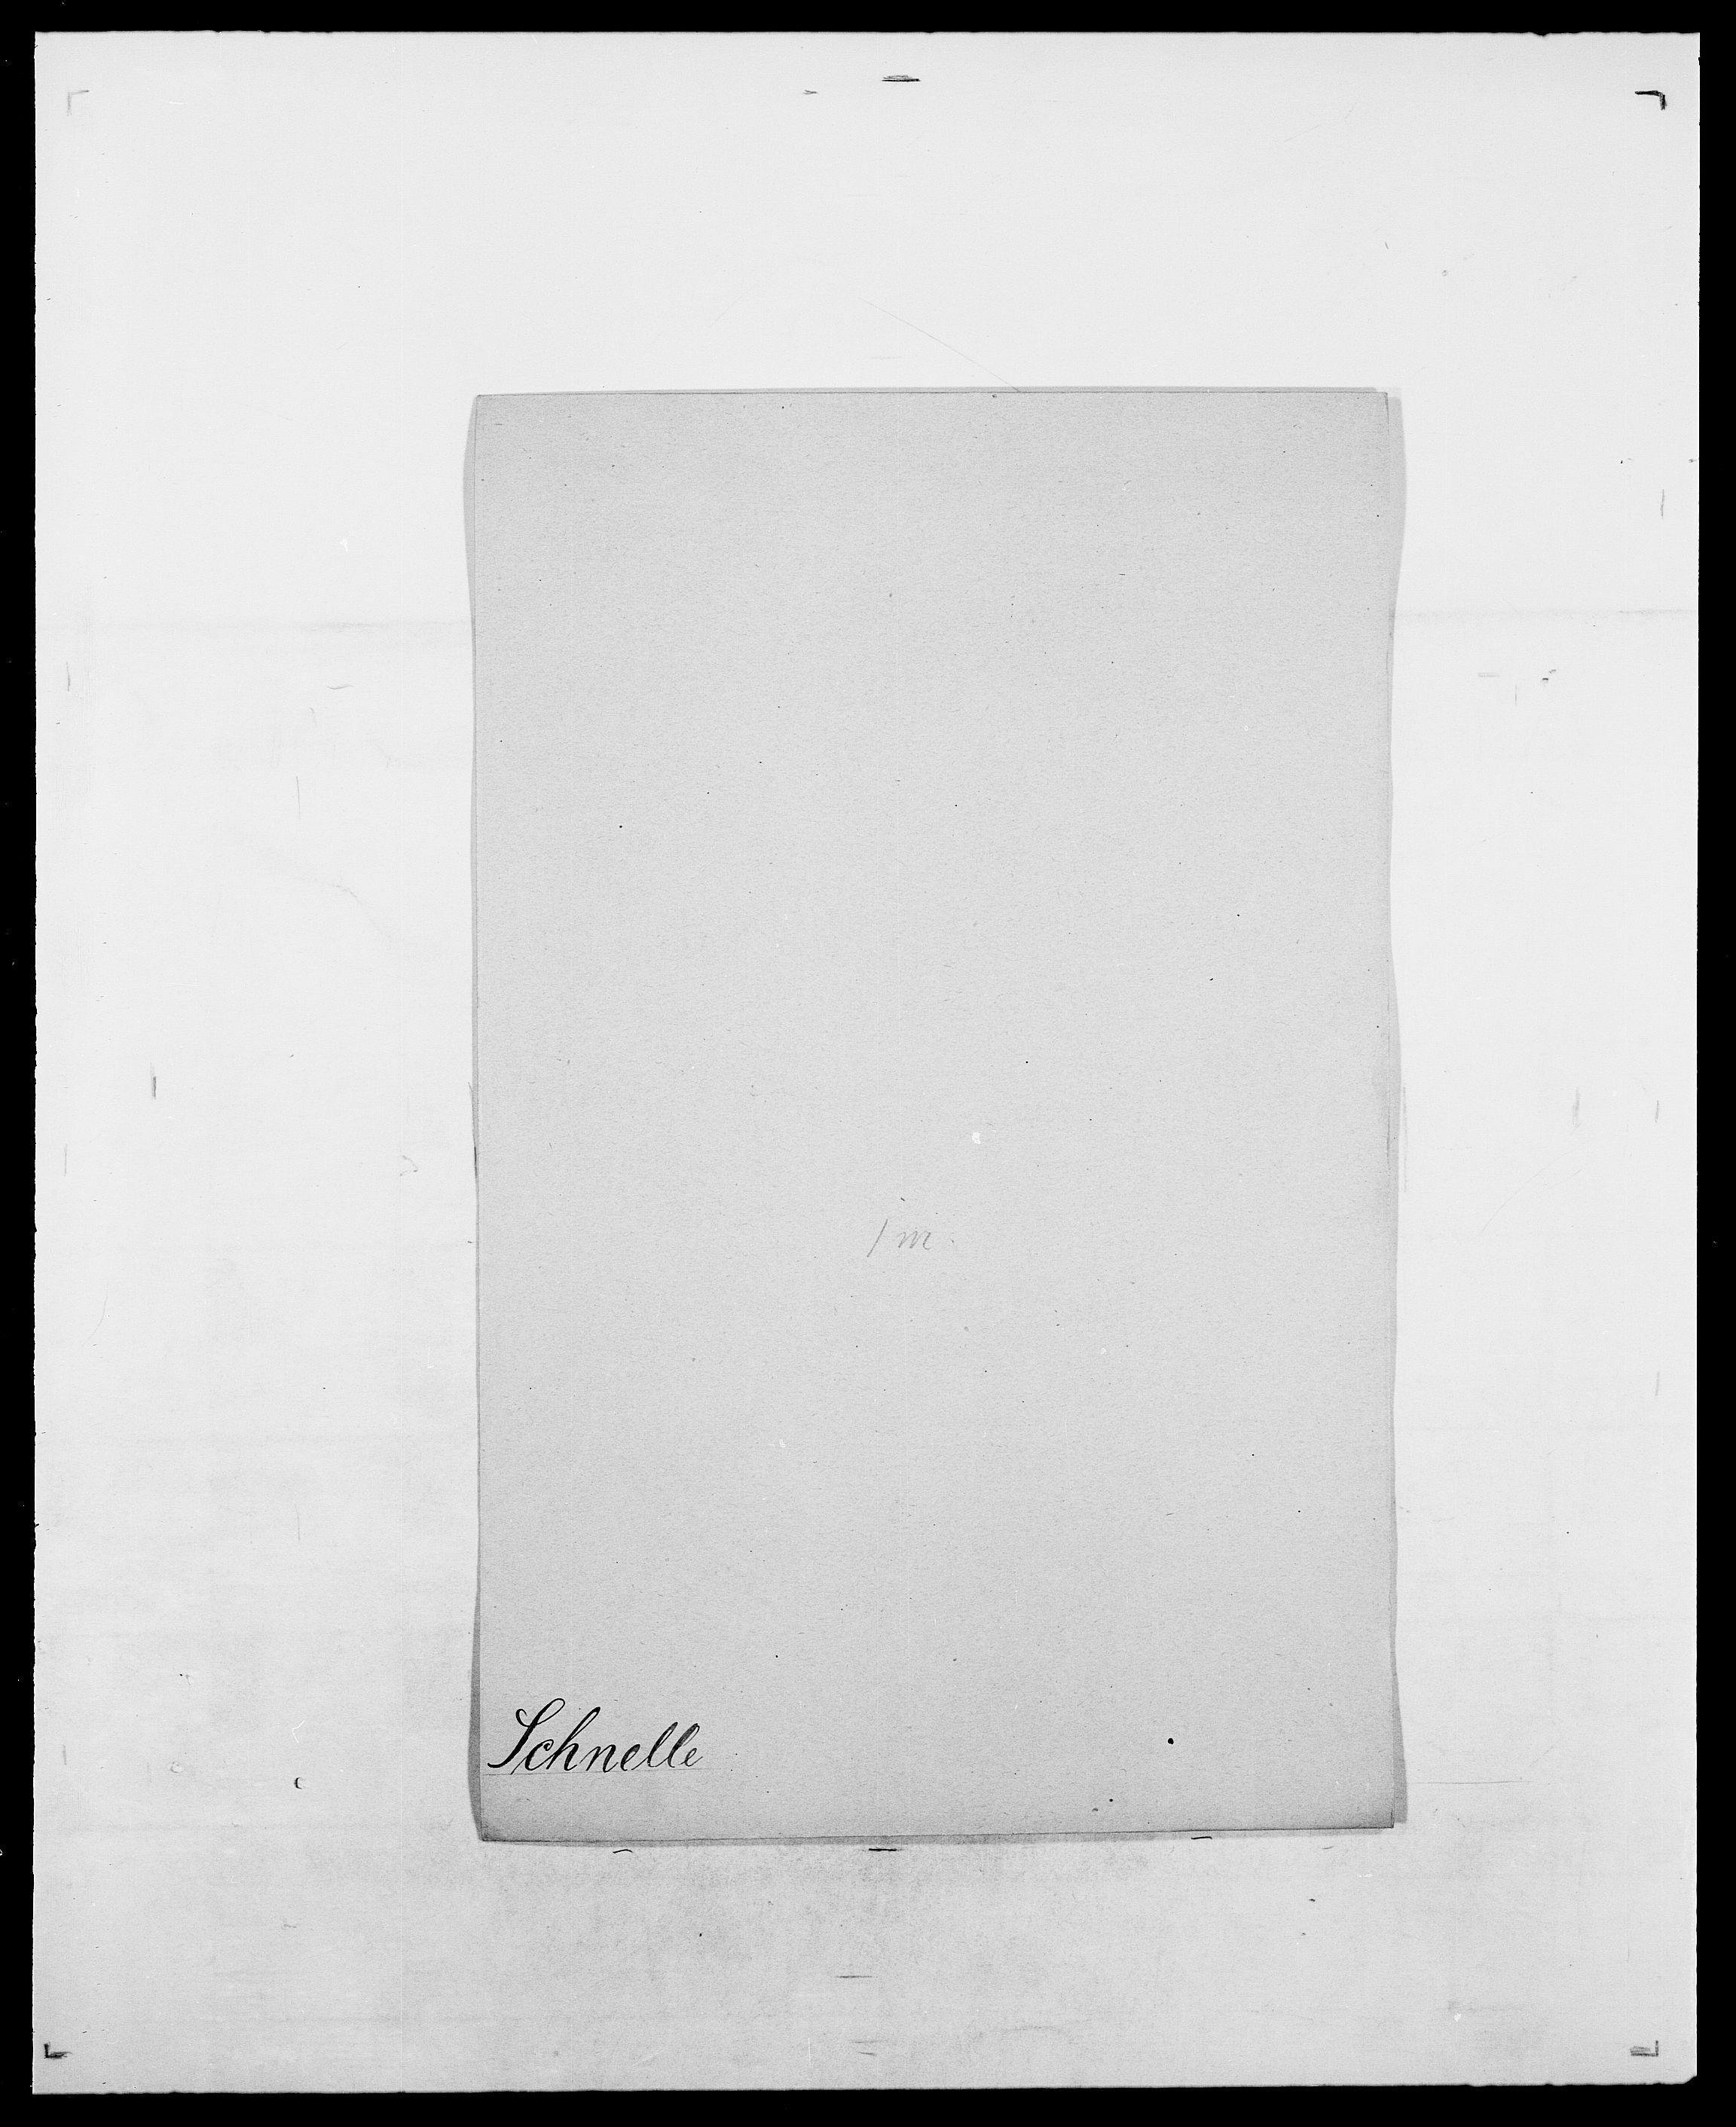 SAO, Delgobe, Charles Antoine - samling, D/Da/L0035: Schnabel - sjetman, s. 40